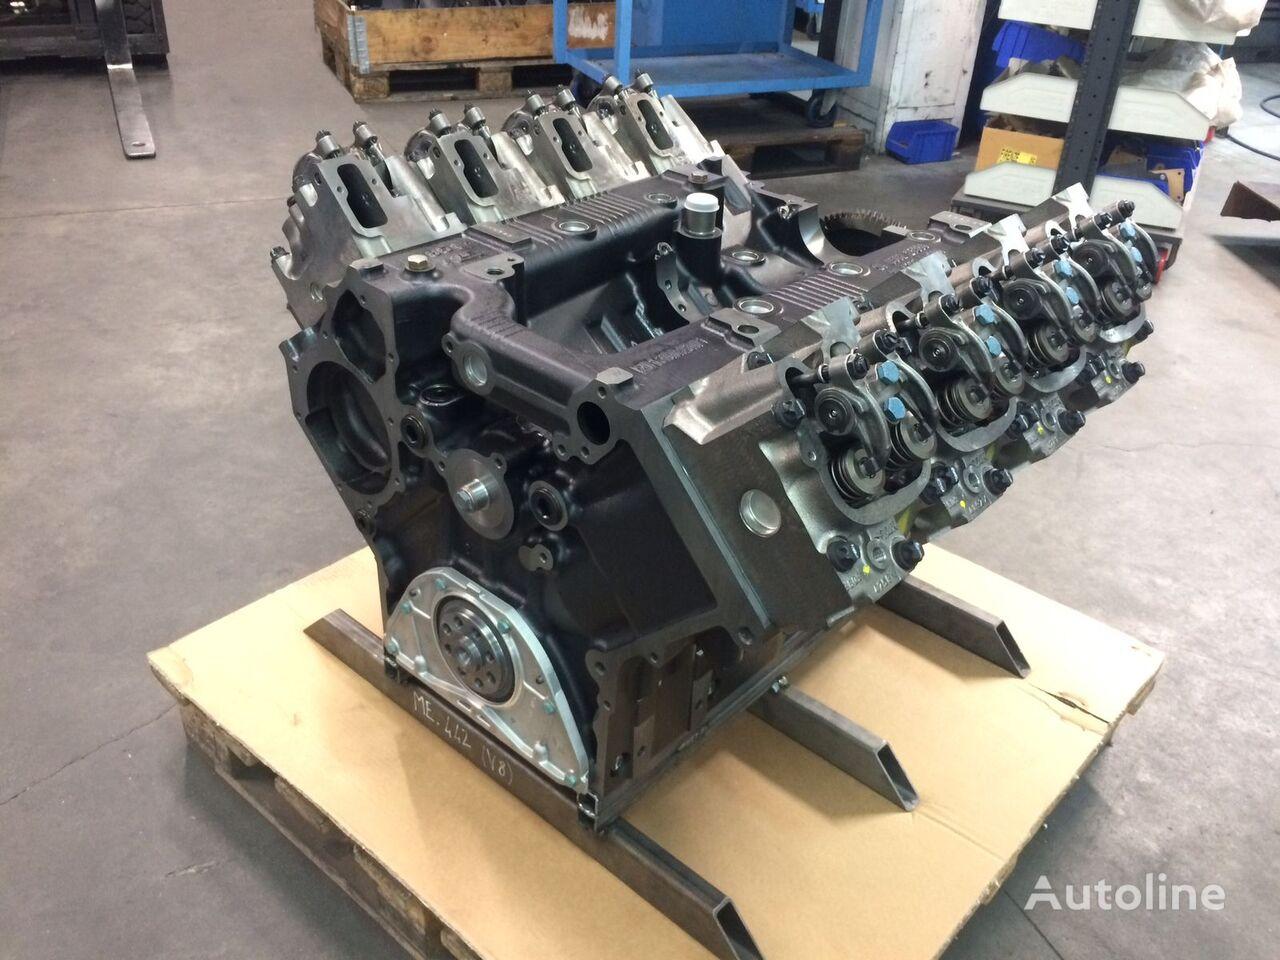 kamyon için MAN - MOTORE D2848 - V8 - STAZIONARIO / INDUSTRIALE e silindir bloğu